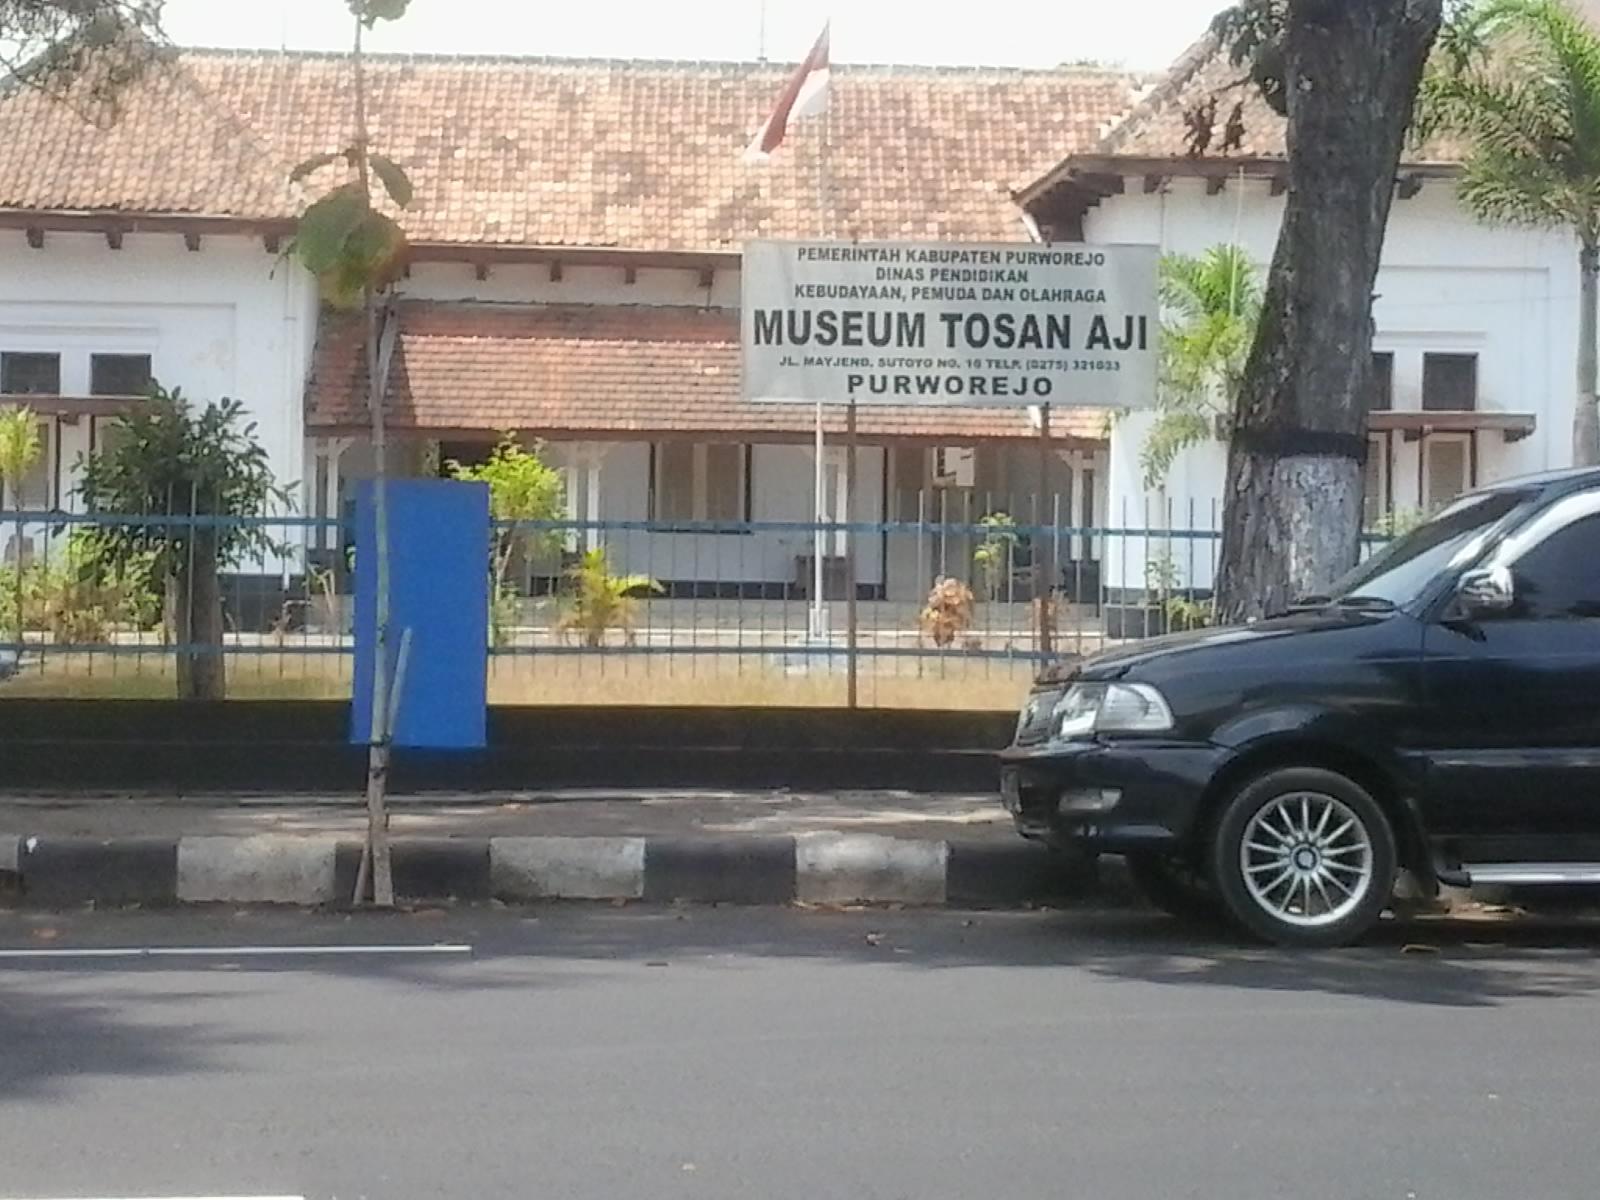 Wisata Budaya Museum Tosan Aji Purworejo Pordjoland Kab